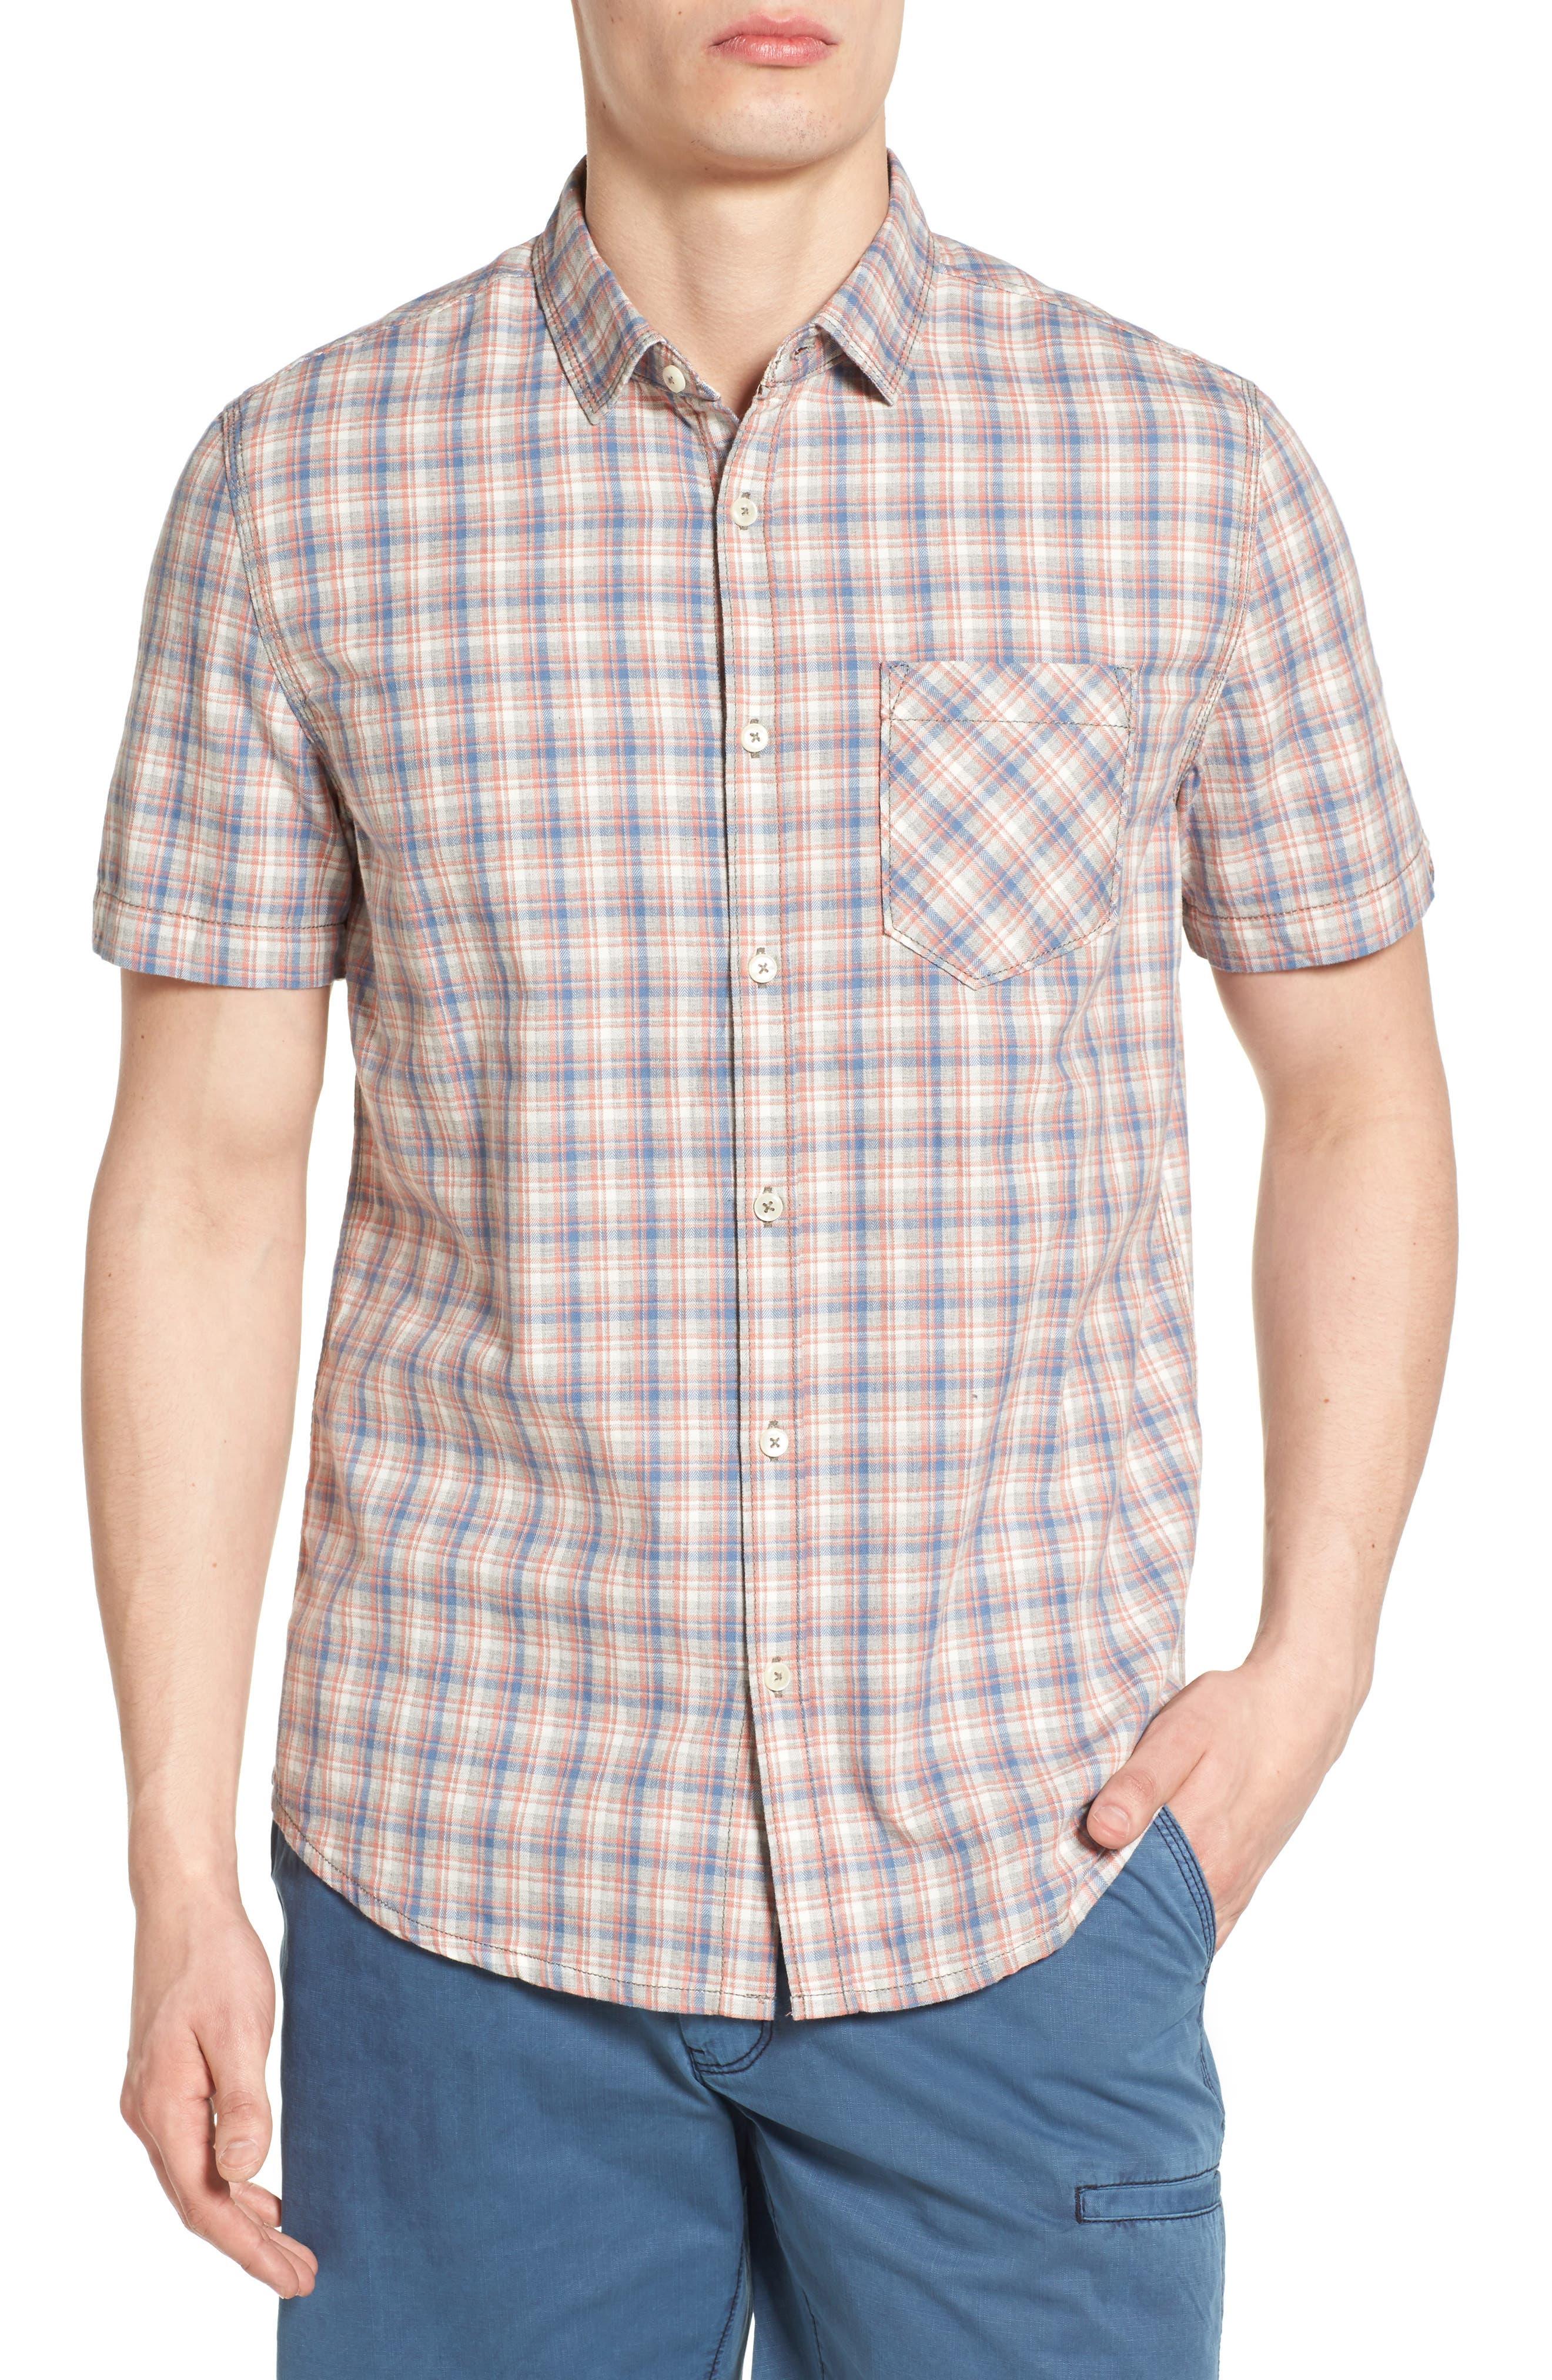 Jeremiah Solana Regular Fit Herringbone Plaid Sport Shirt